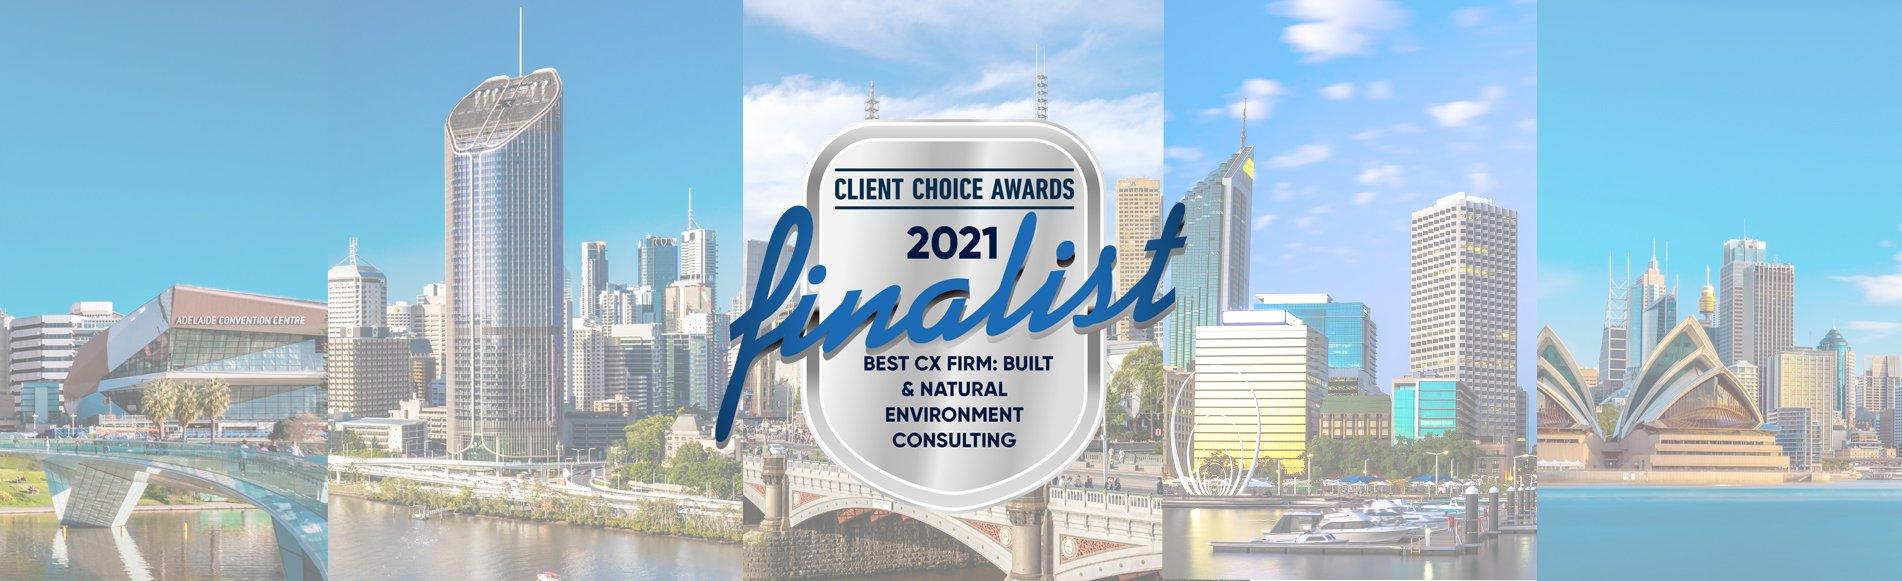 Client Choice Awards Finalist